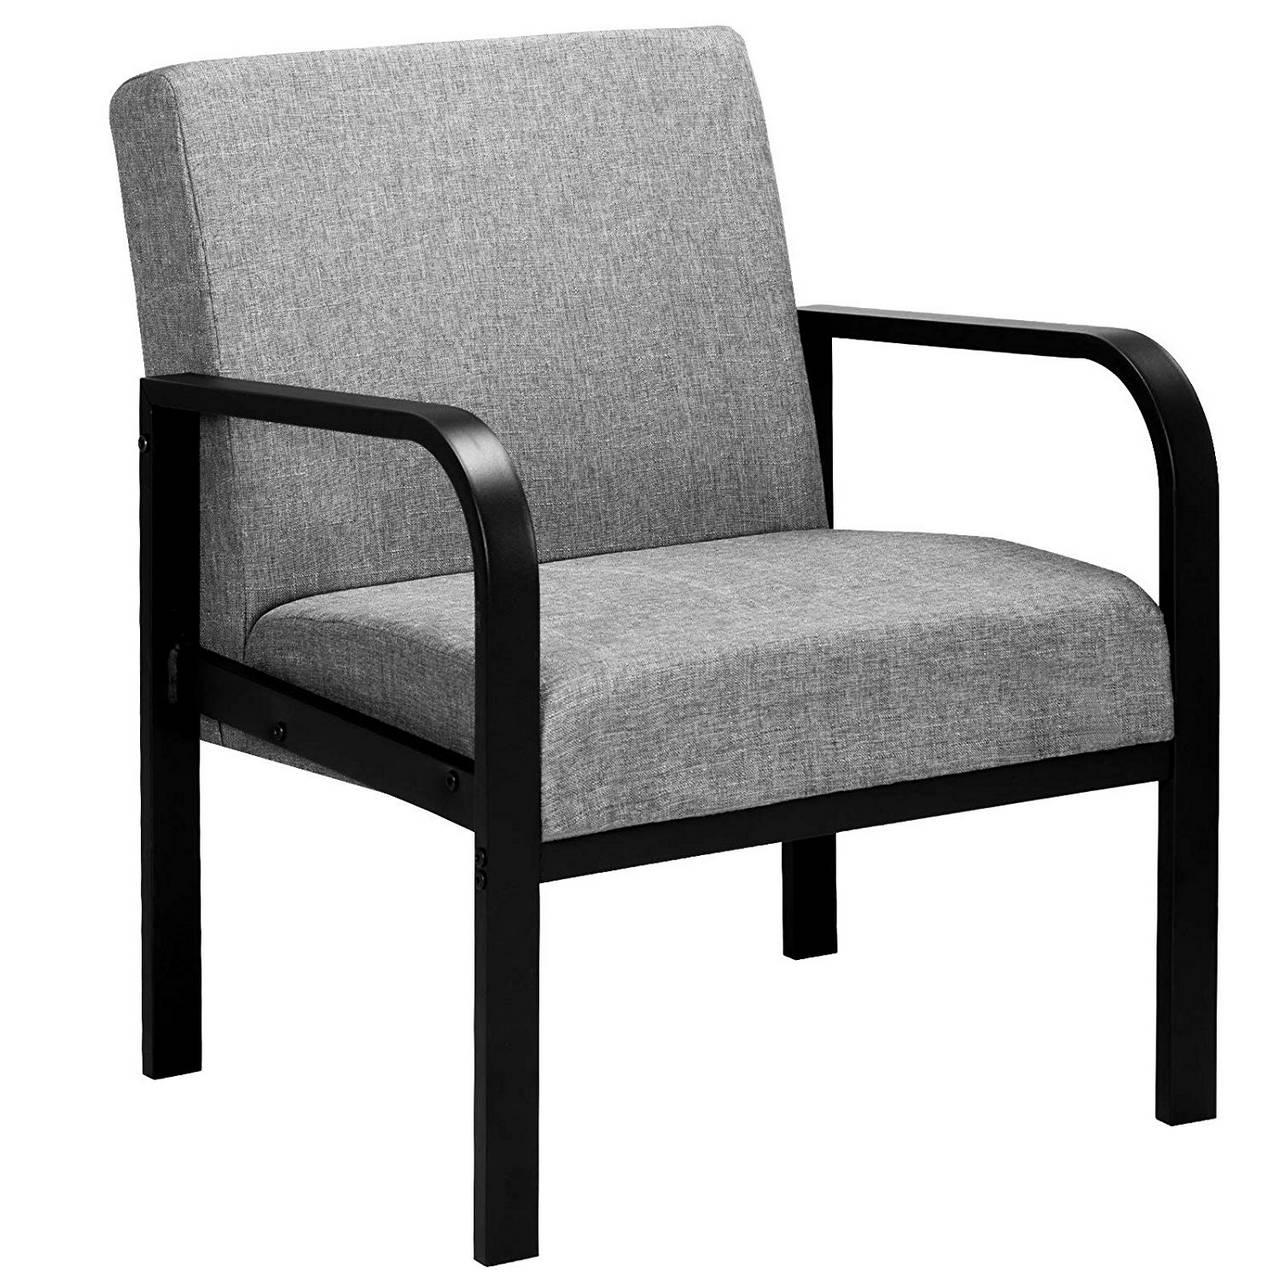 Loungesessel Polstersessel aus Stahl Stoffbezug Grau1